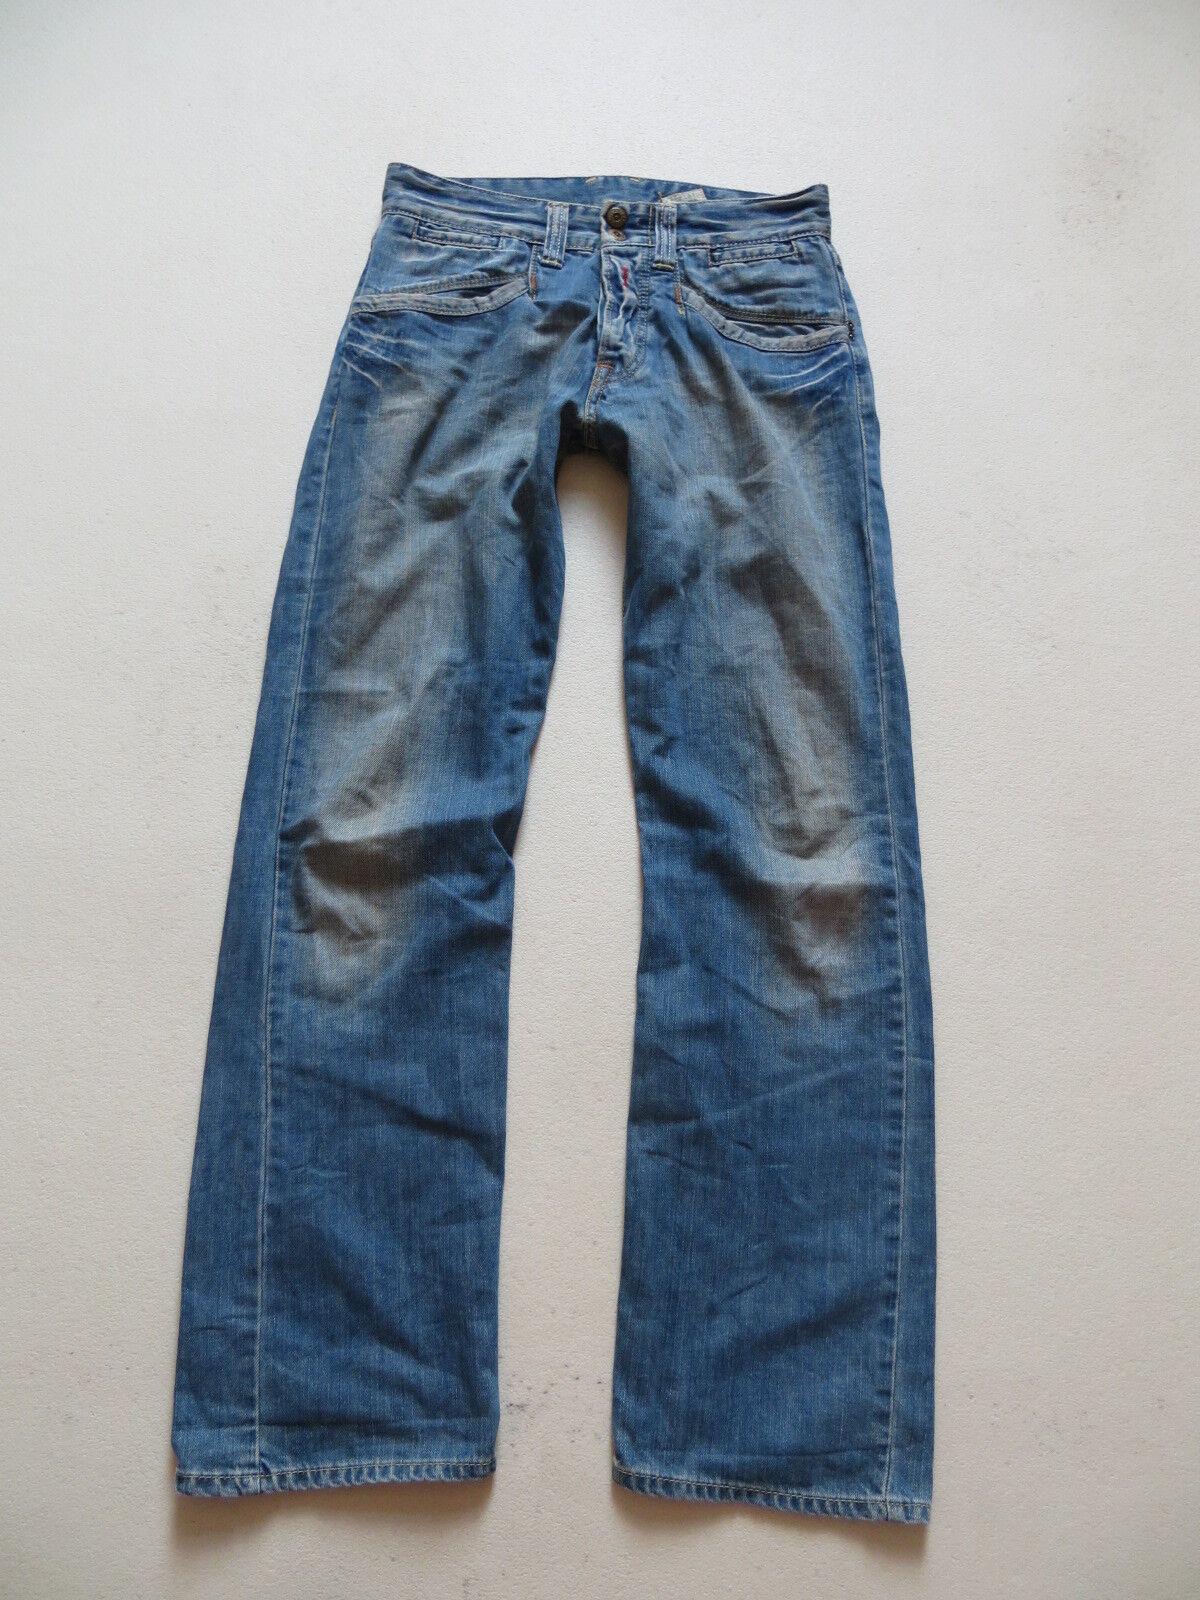 REPLAY MV 943A Jeans Hose, W 30  L 32, faded wash USED Denim mit Knopfleiste